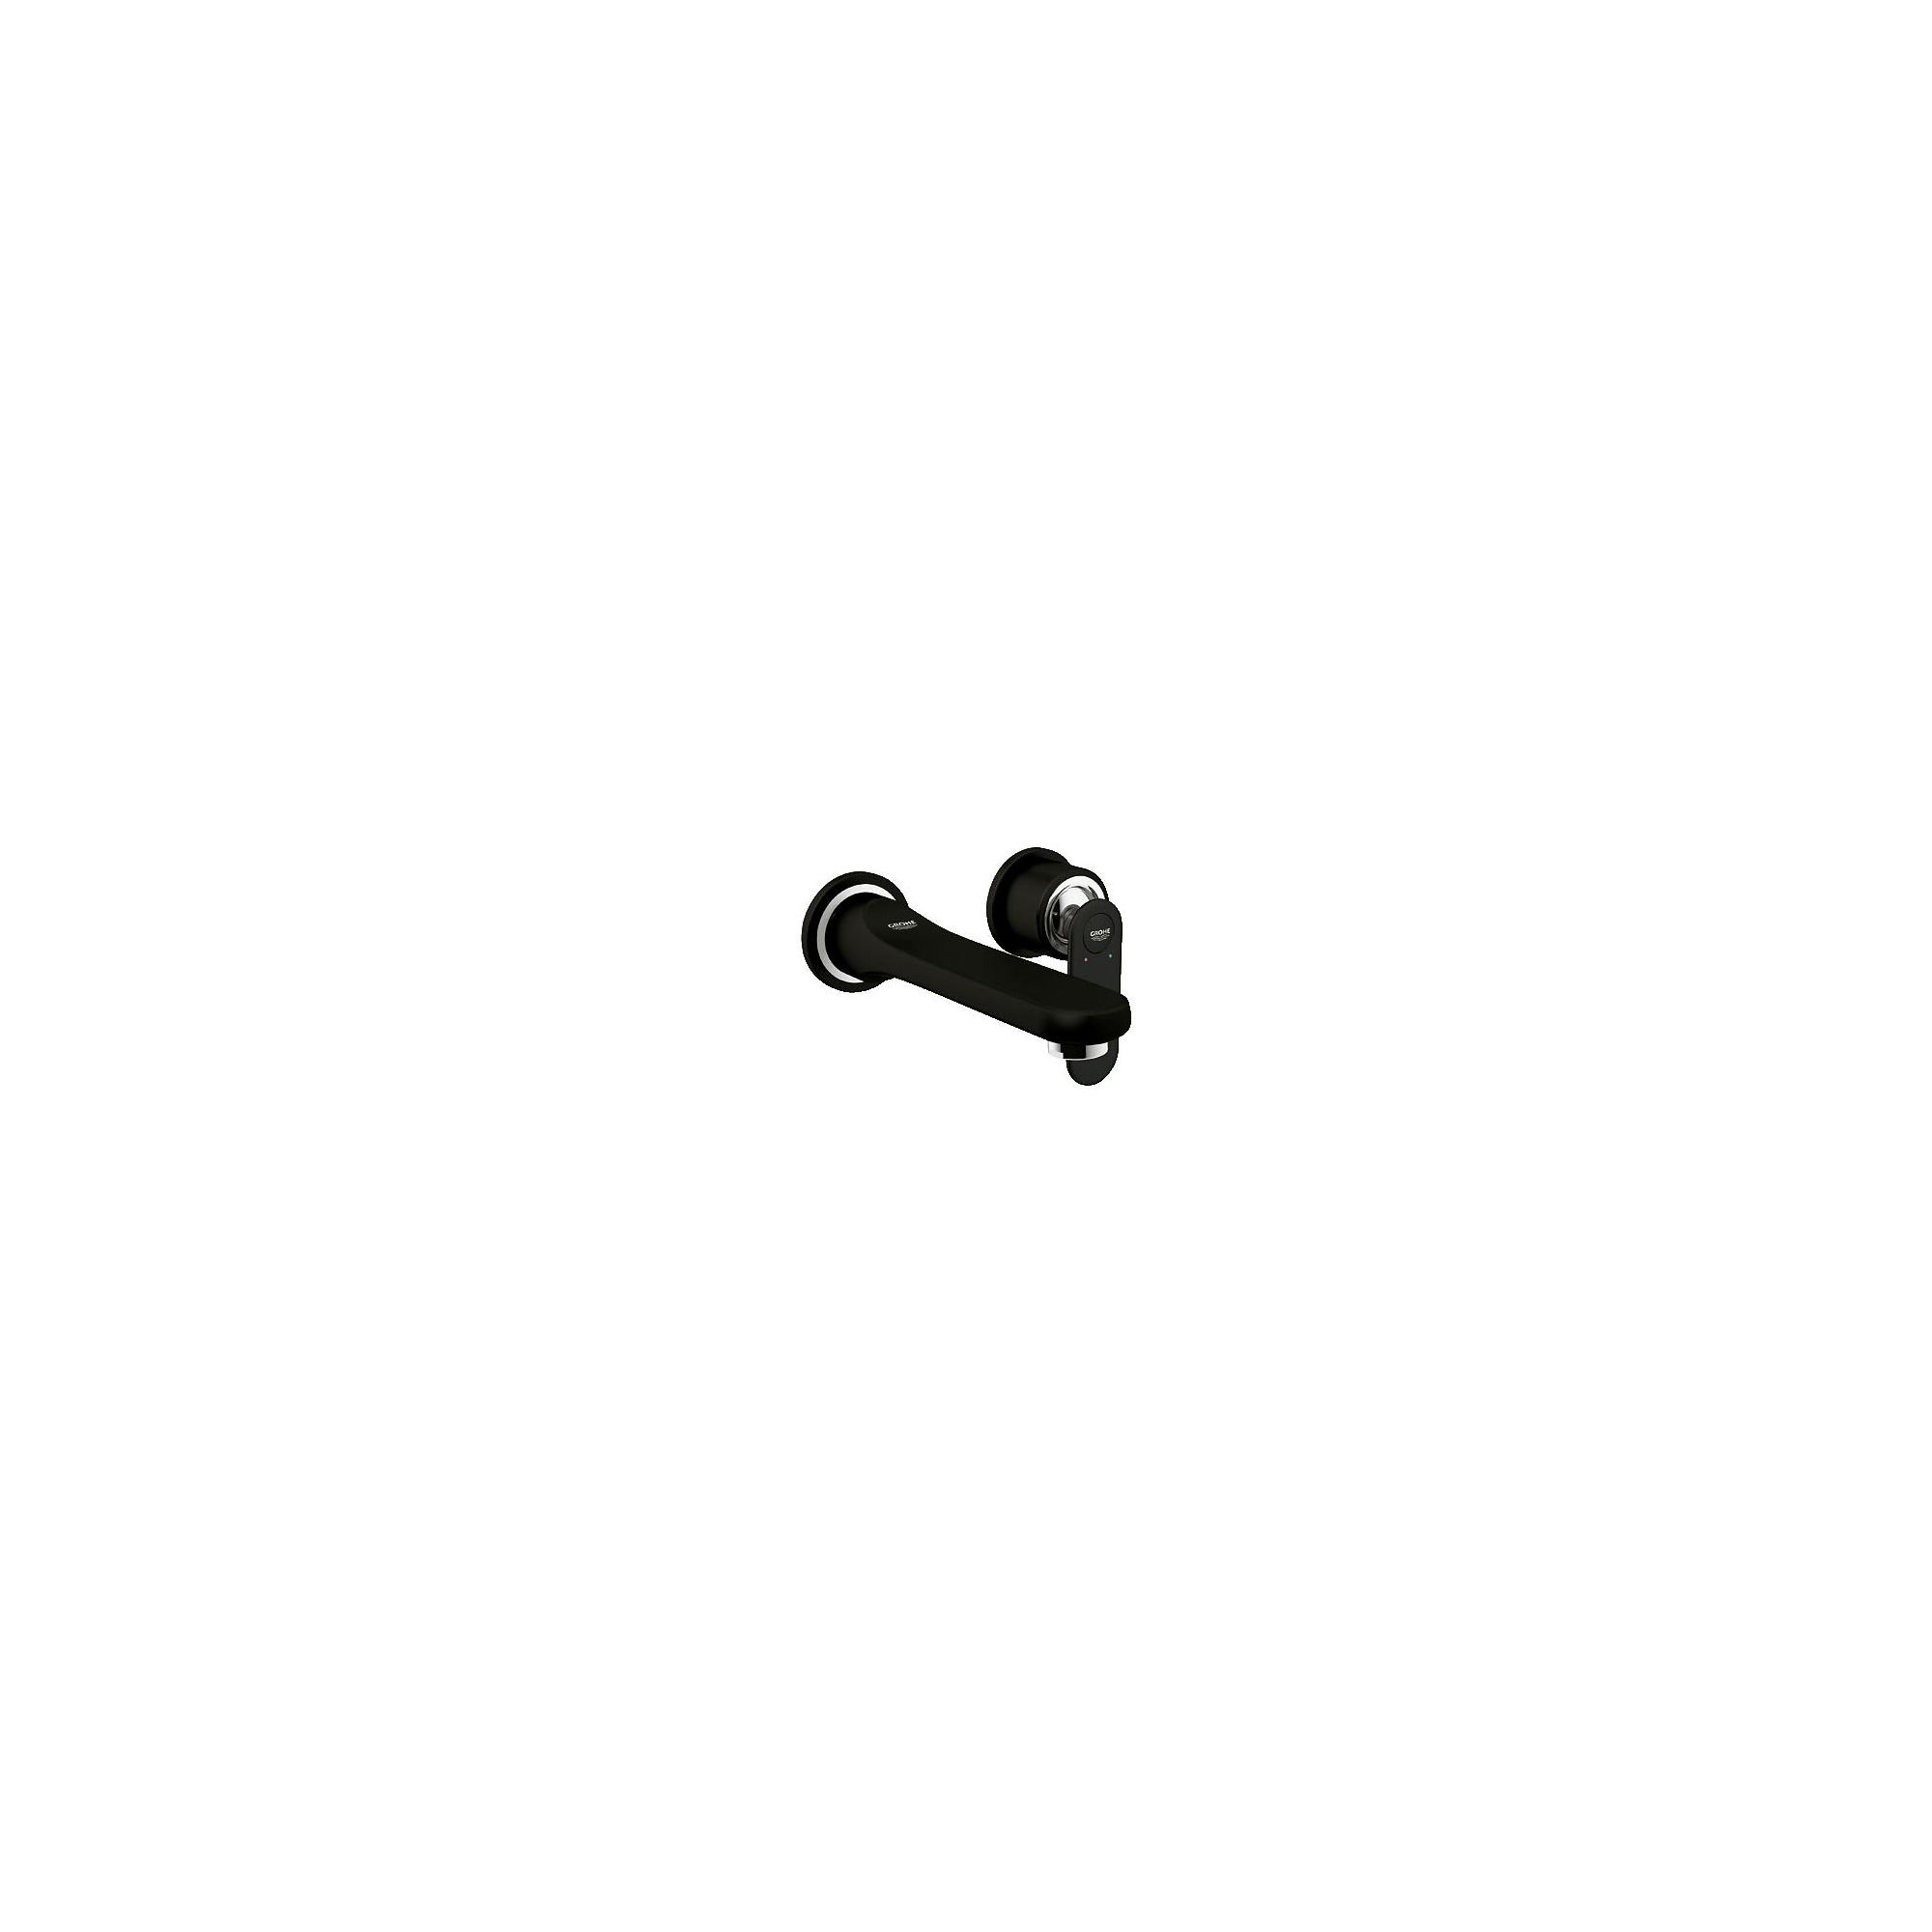 Grohe Veris 2-Hole Basin Mixer Tap, Wall Mounted, Velvet Black at Tesco Direct